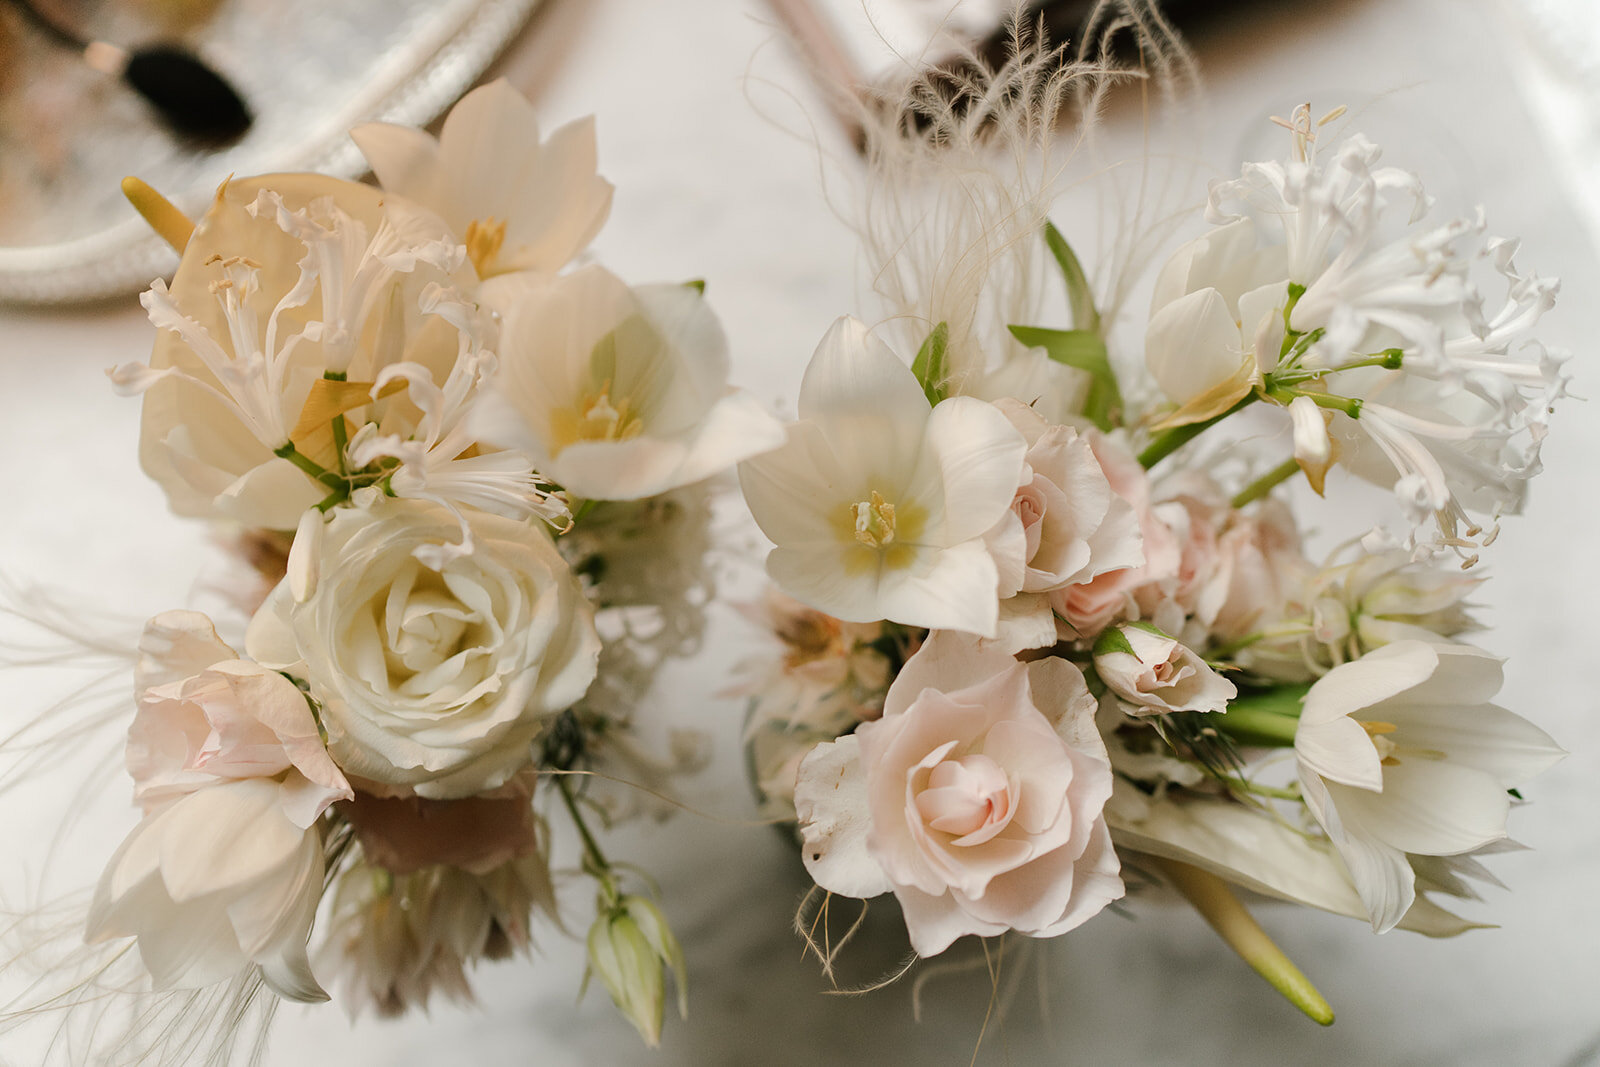 London Wedding Flowers Off Season Wedding Ideas For Postponed London Weddings Still Life Flowers